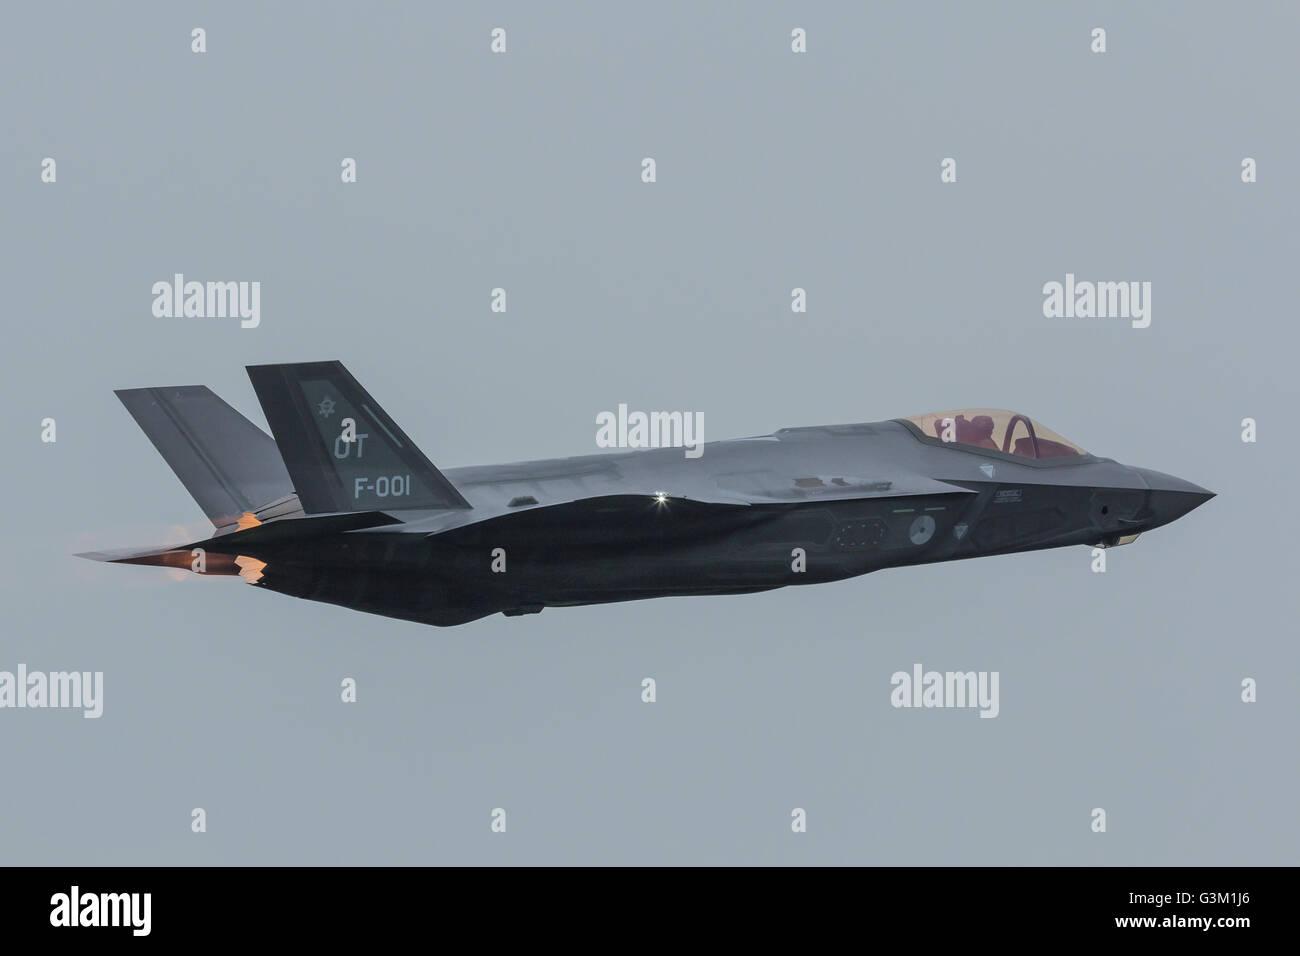 F-35 Lightning II of RNLAF - Stock Image